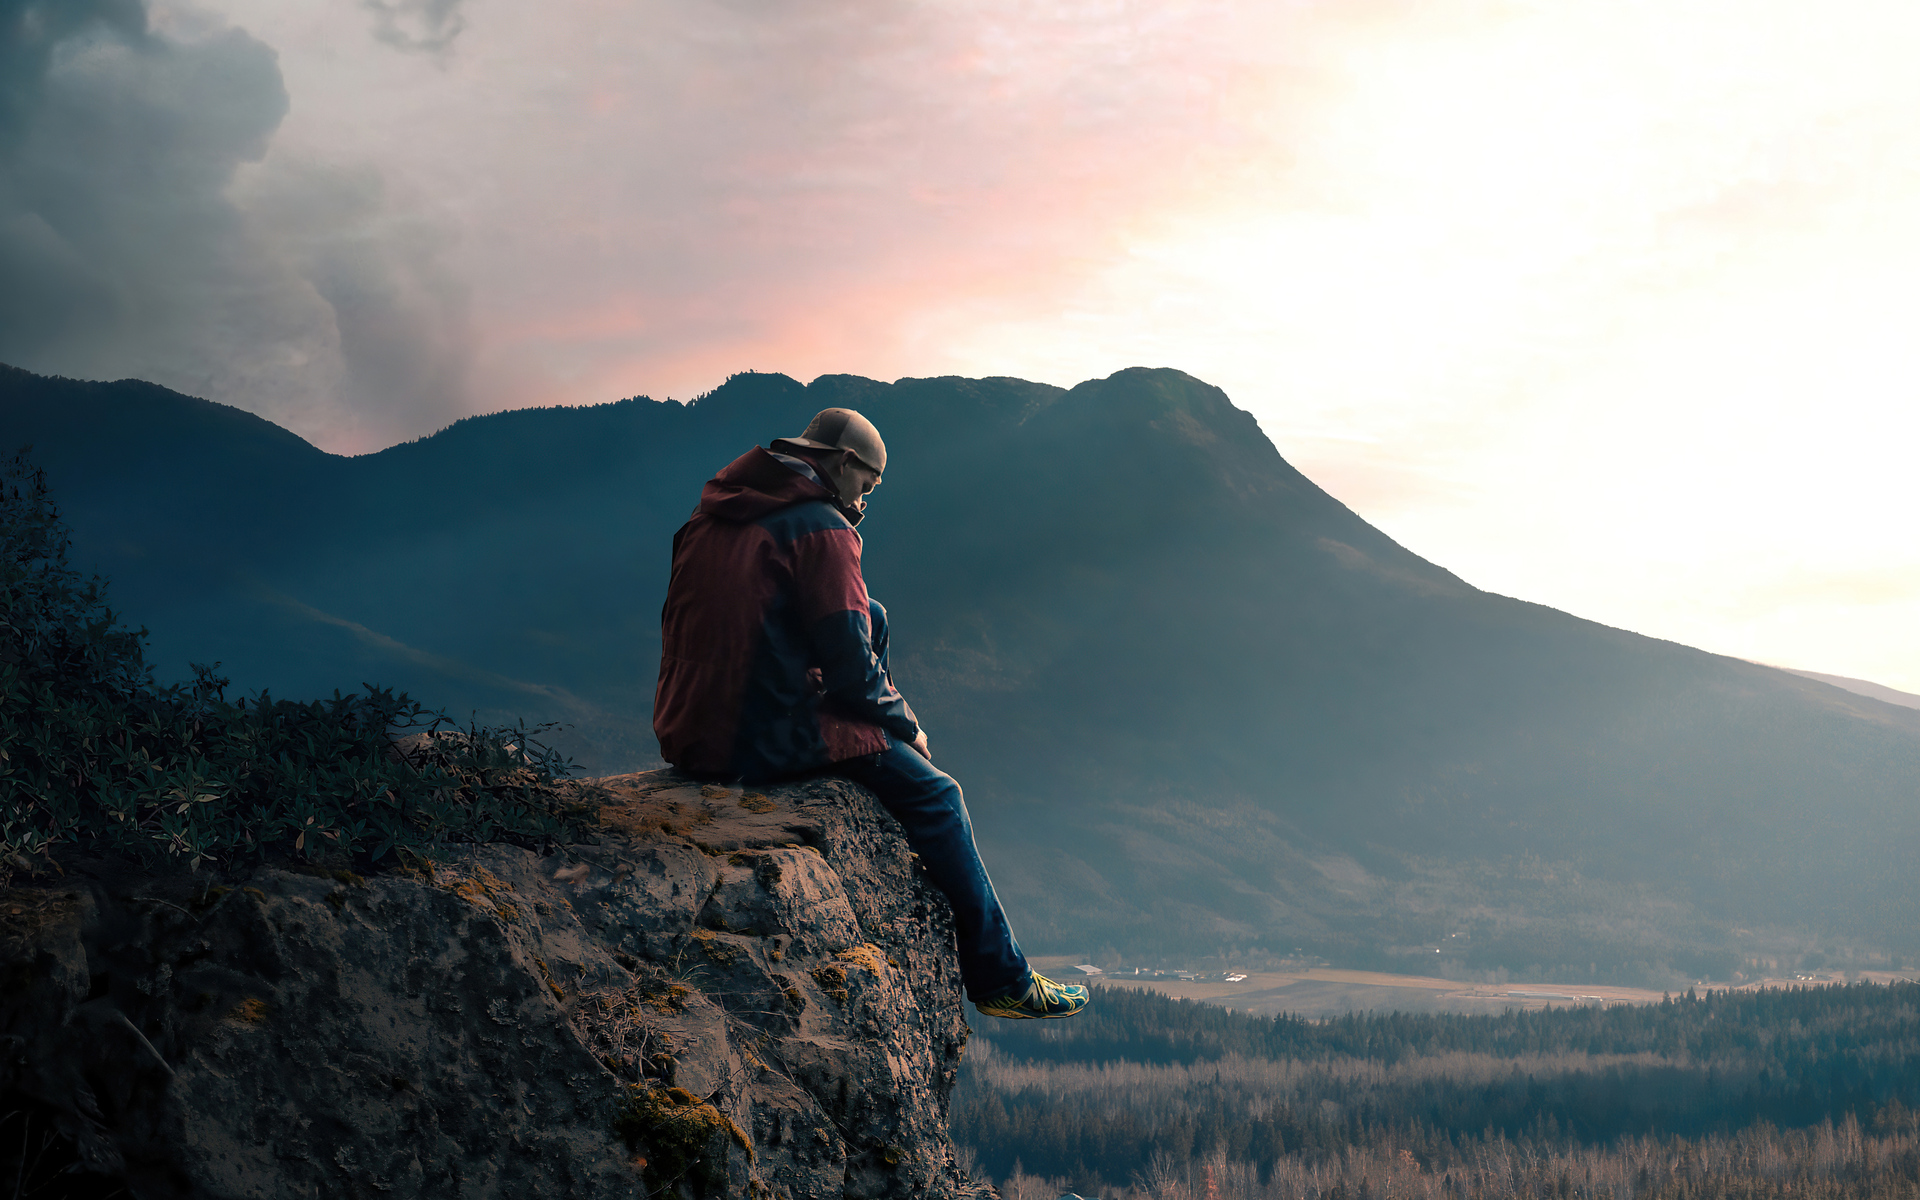 boy-sitting-alone-on-high-mountain-rock-5k-rj.jpg